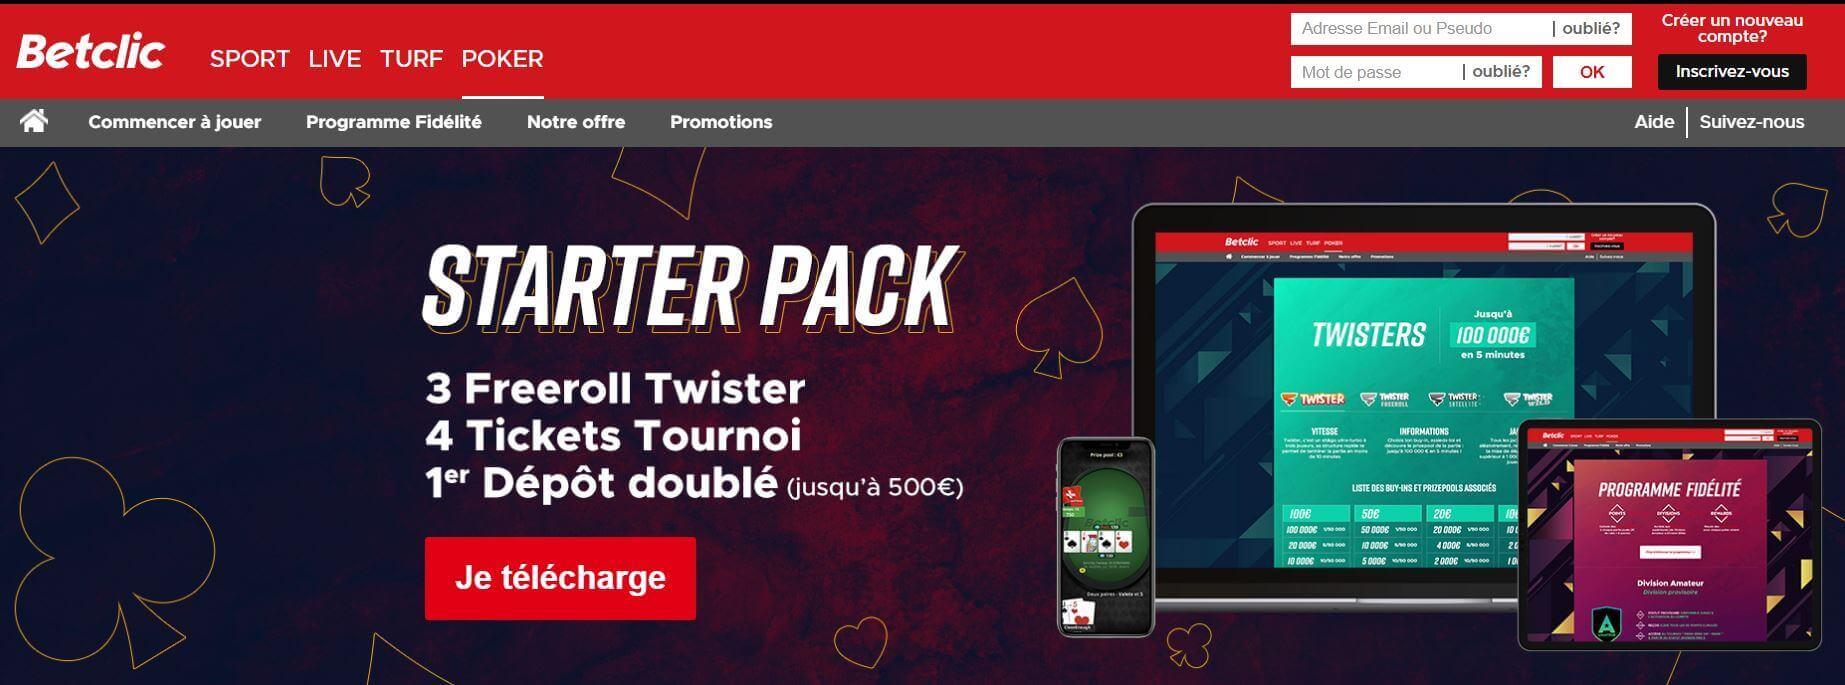 betclic poker mobile